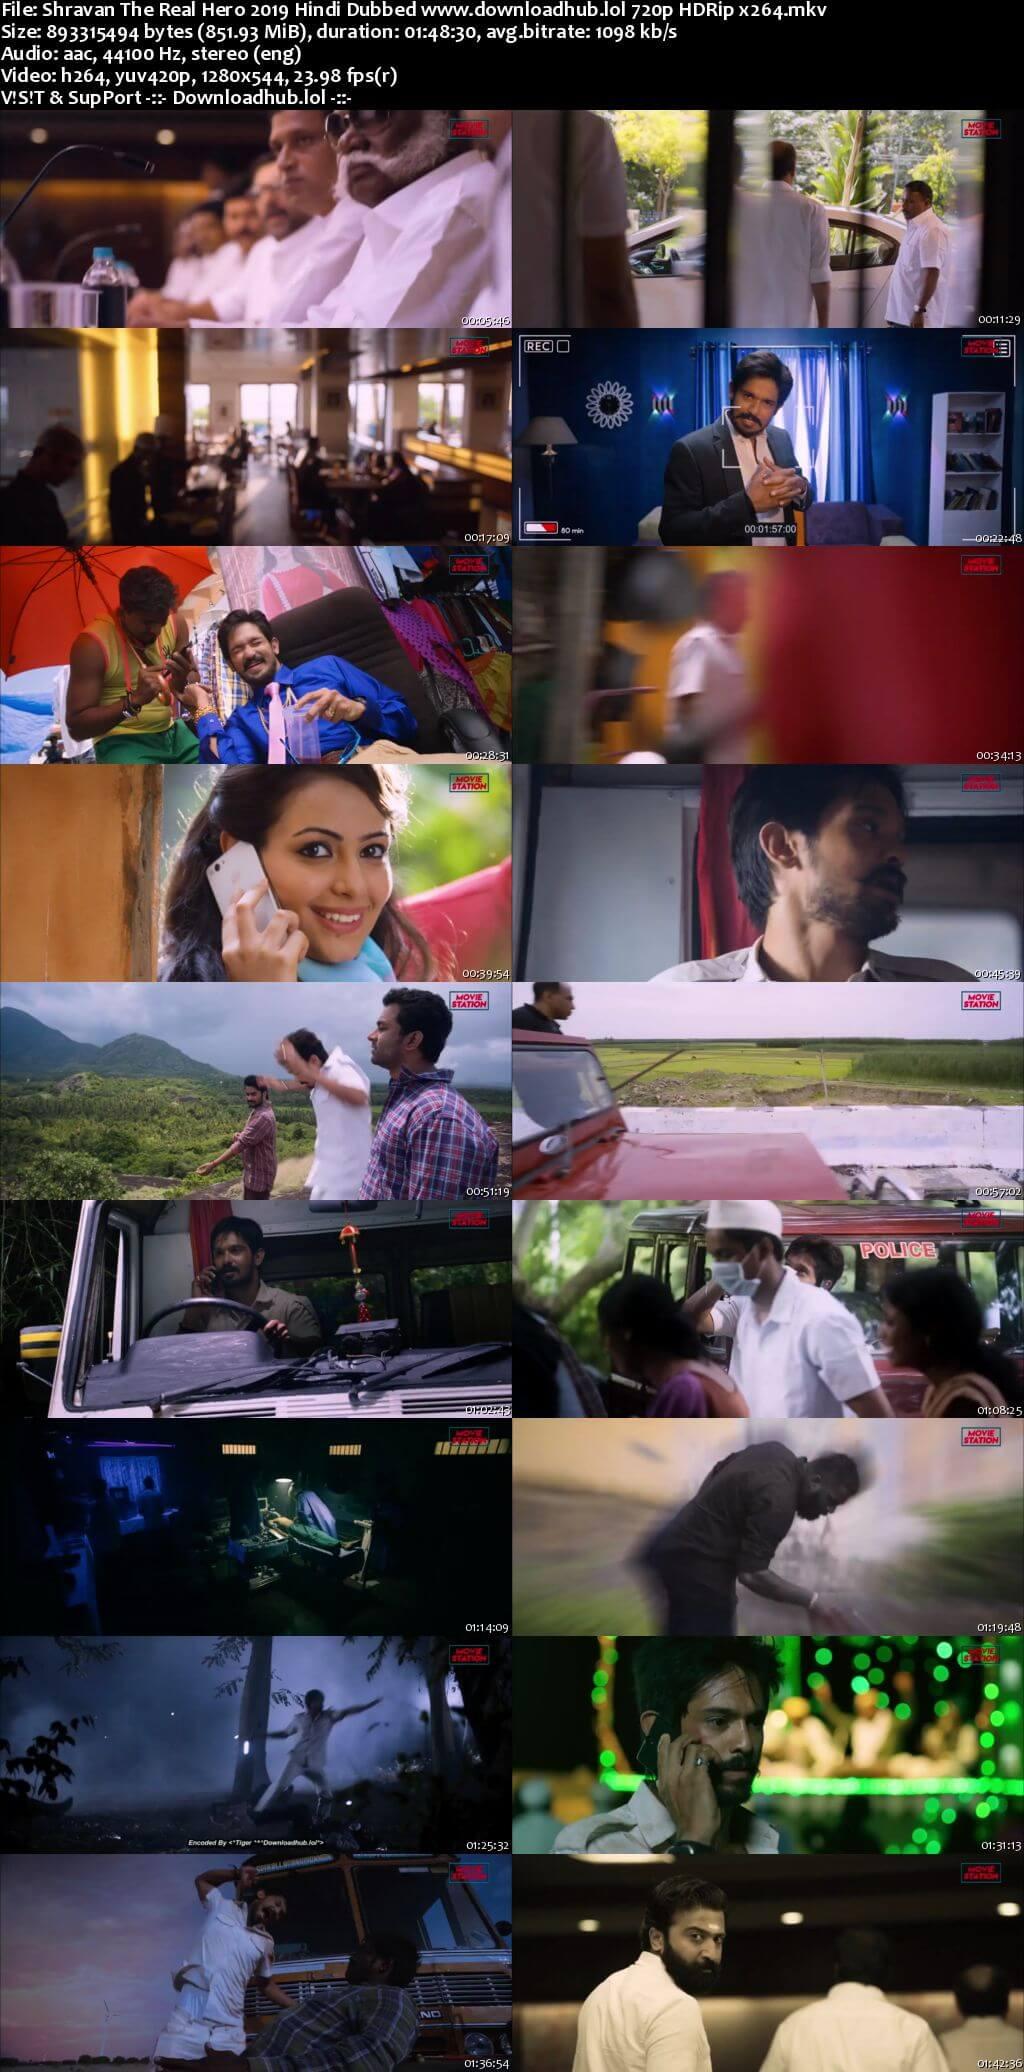 Shravan The Real Hero 2019 Hindi Dubbed Movie 720p HDRip Download